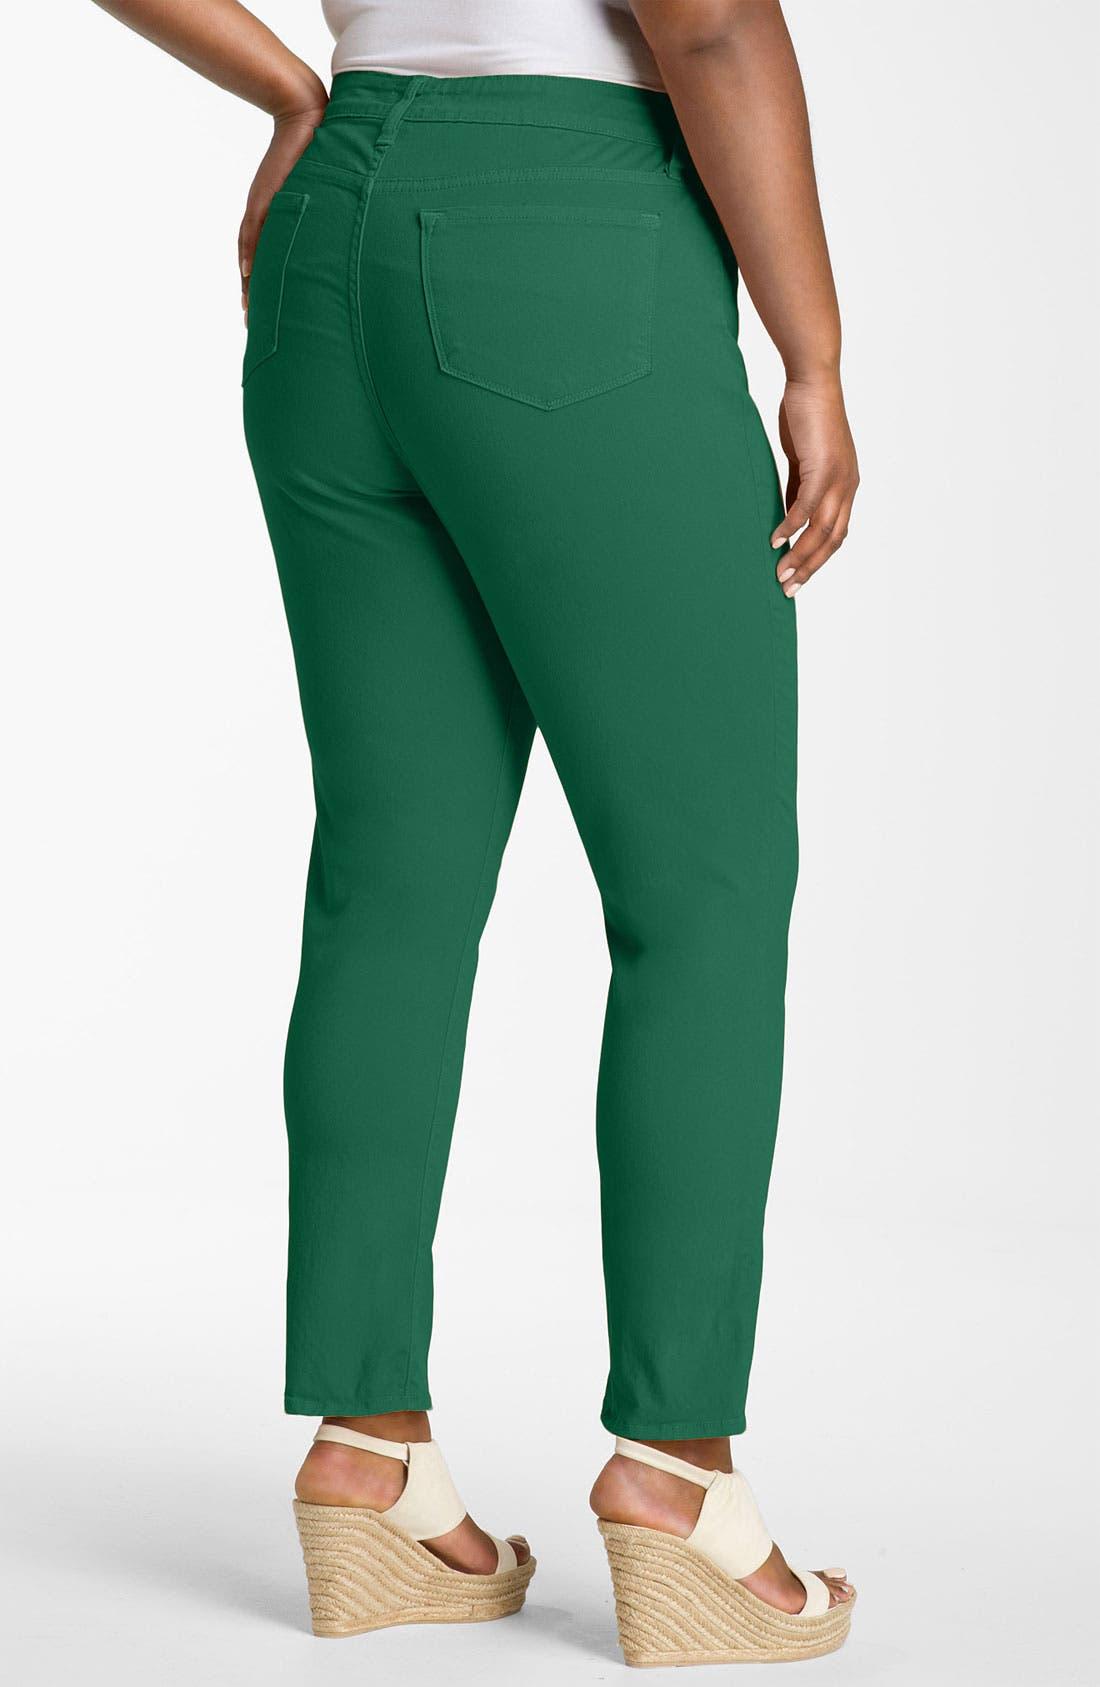 Main Image - Blue Essence Colored Twill Skinny Jeans (Plus)